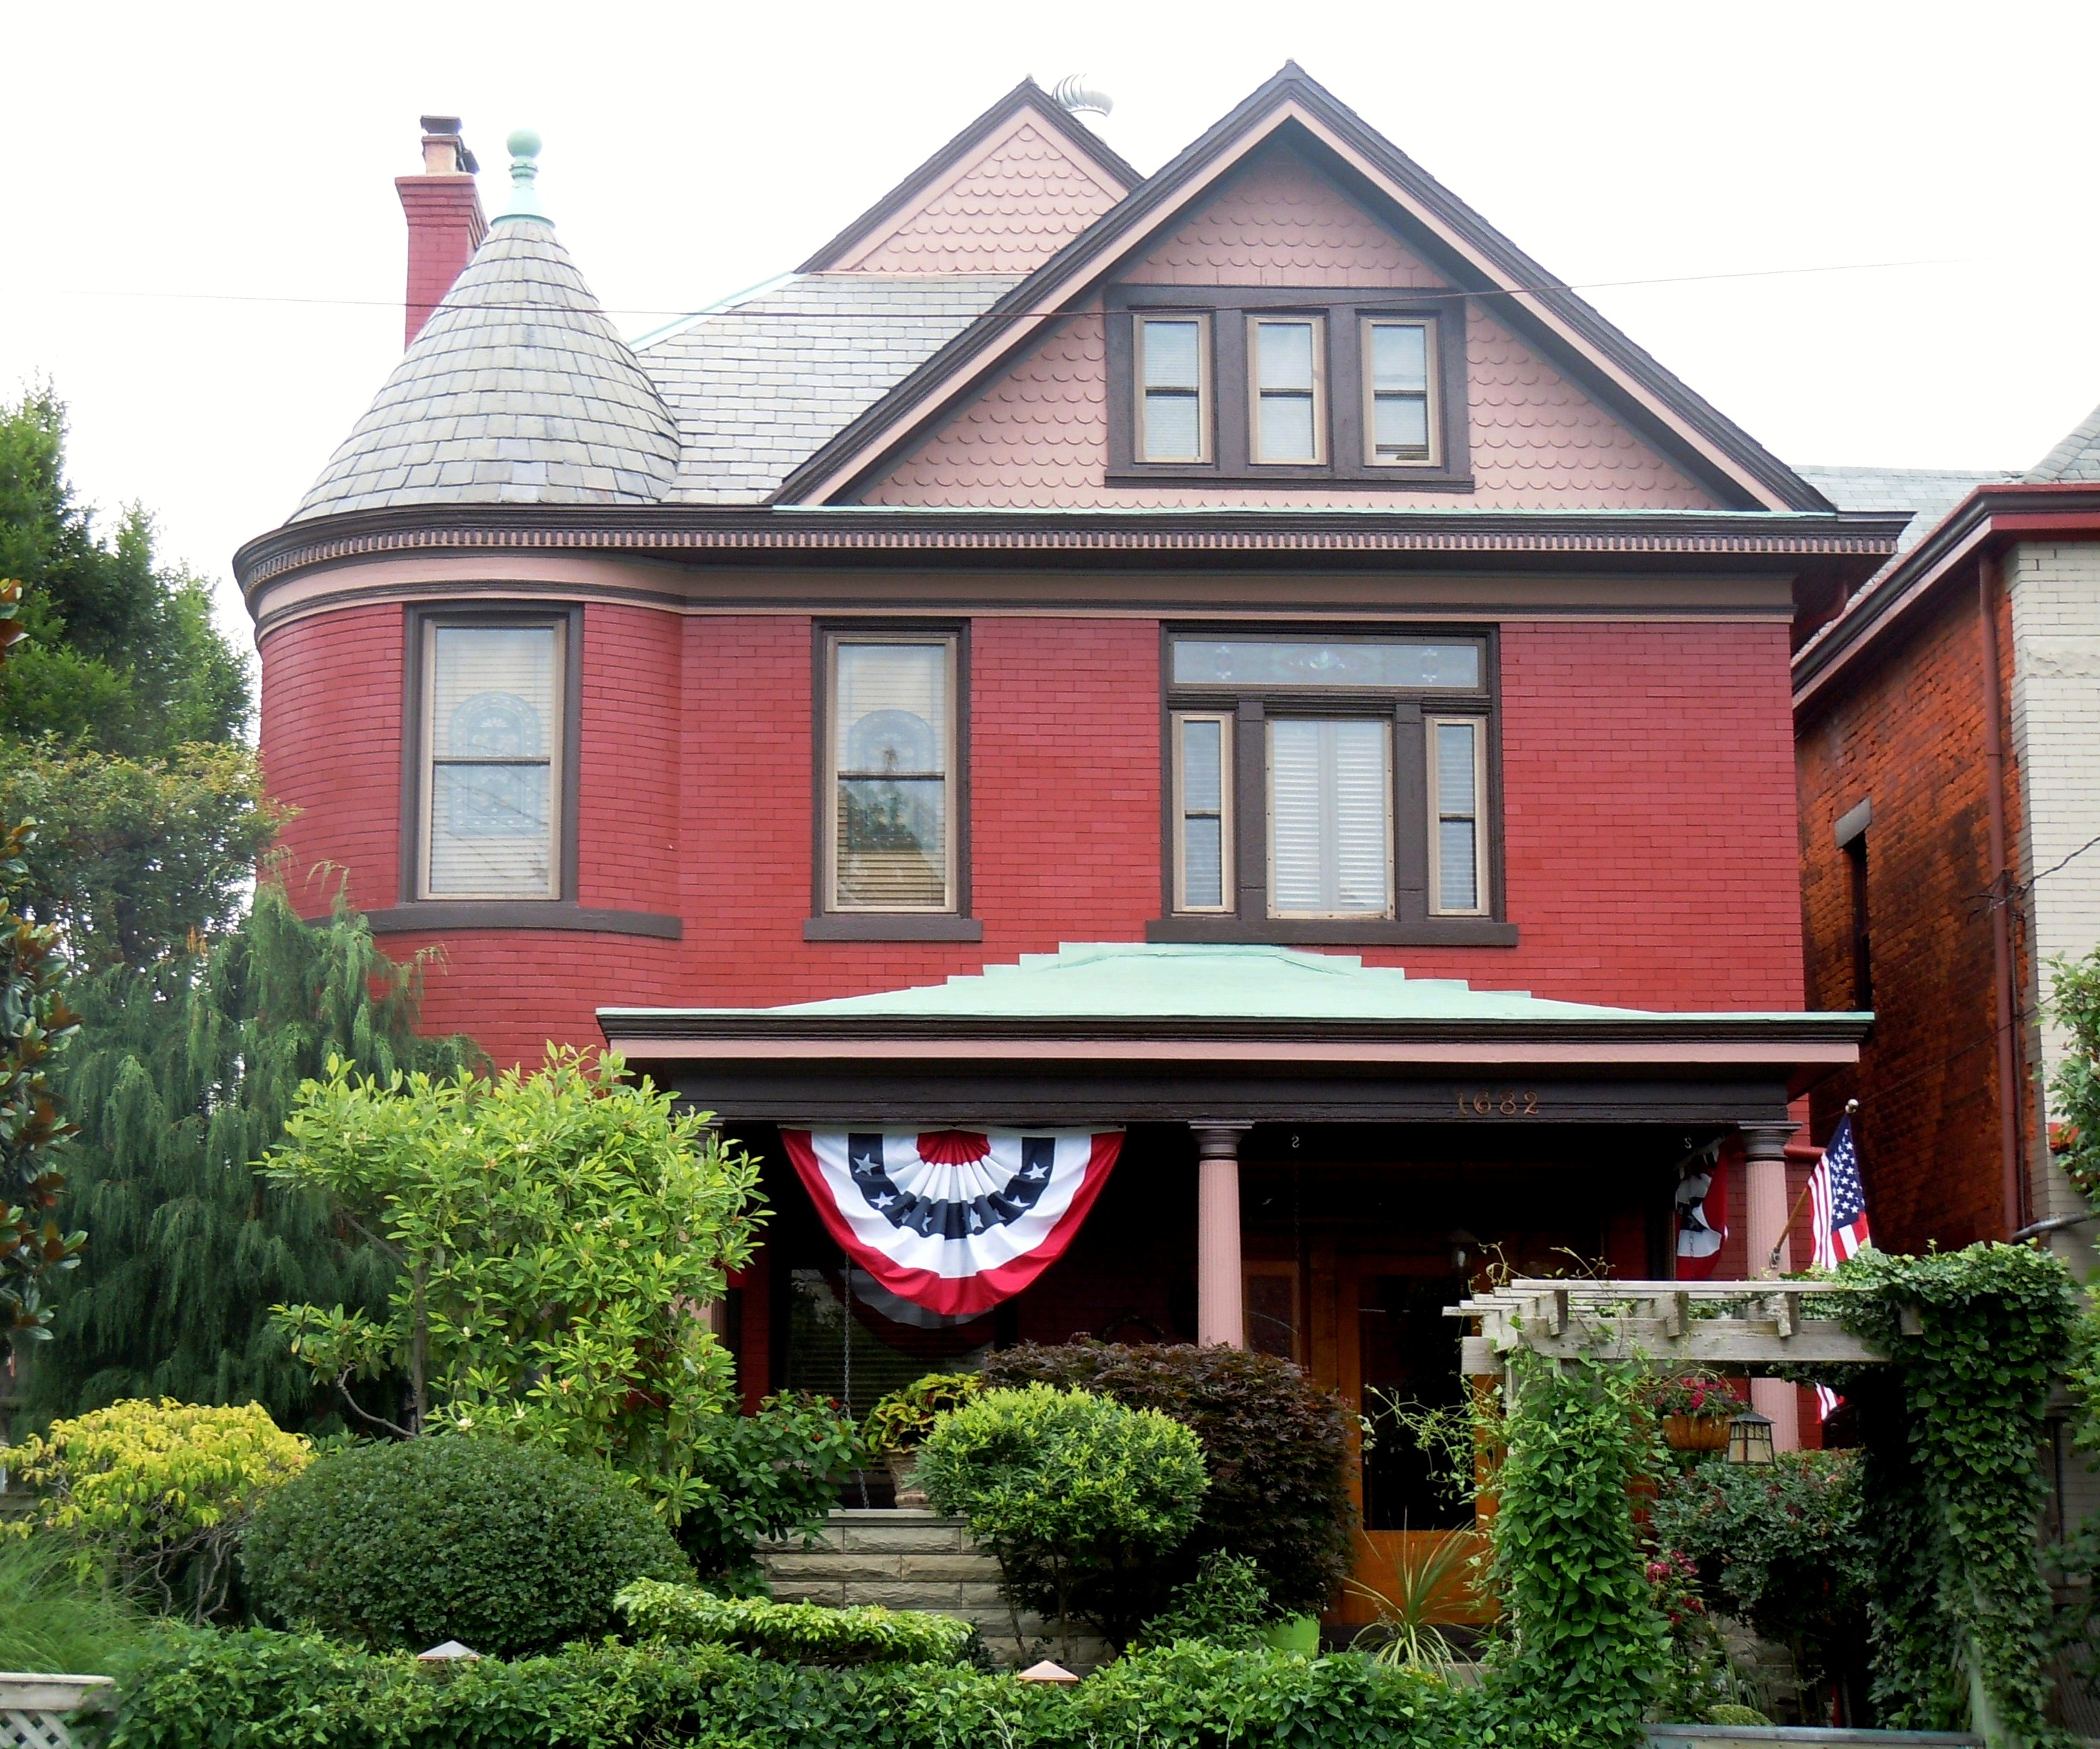 Shelton Victorian Queen Anne Cincinnati Ohio Historic House Colors